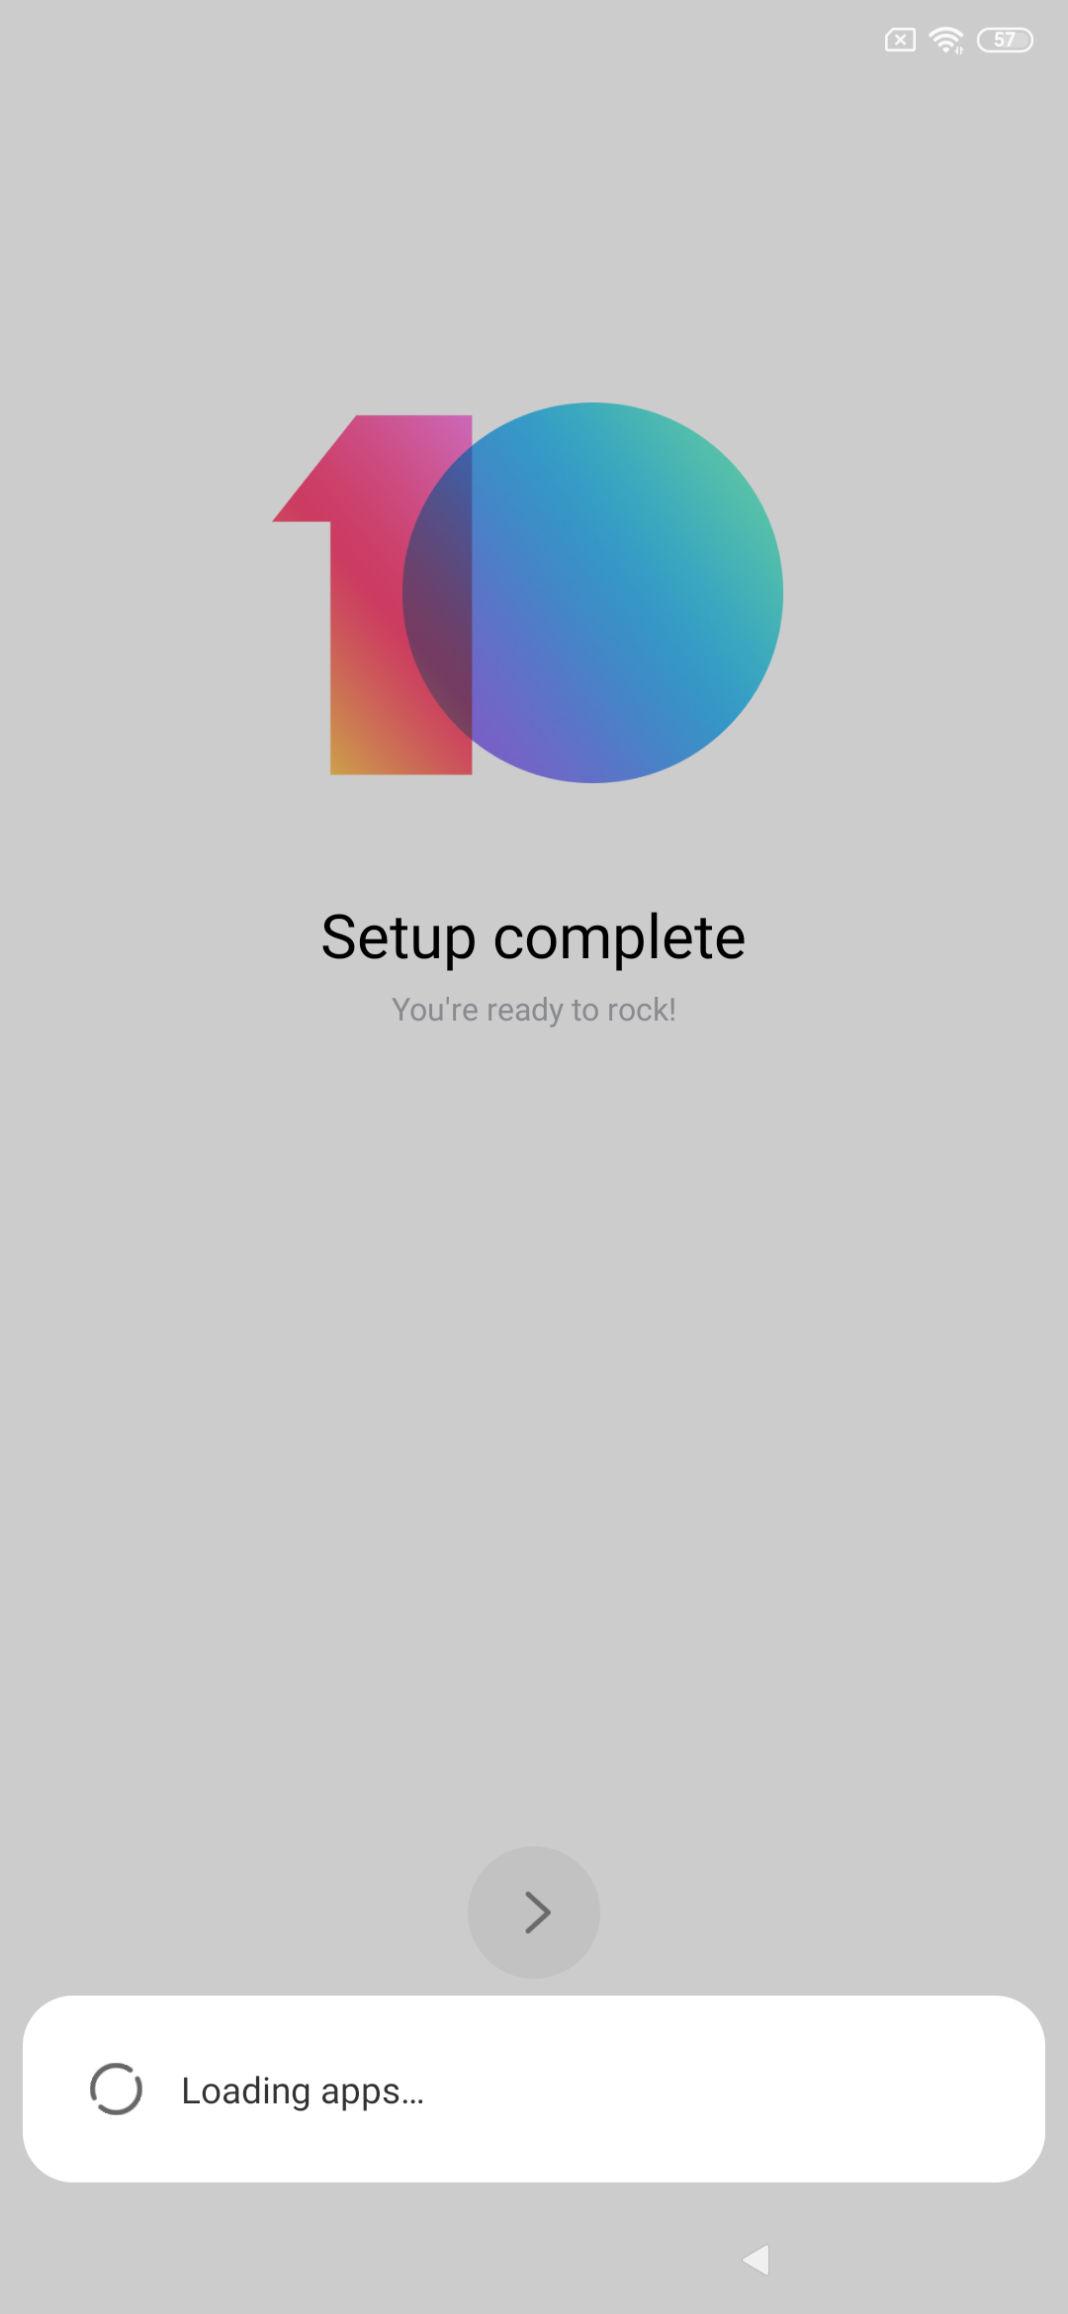 Redmi K20 Pro Software Screenshot